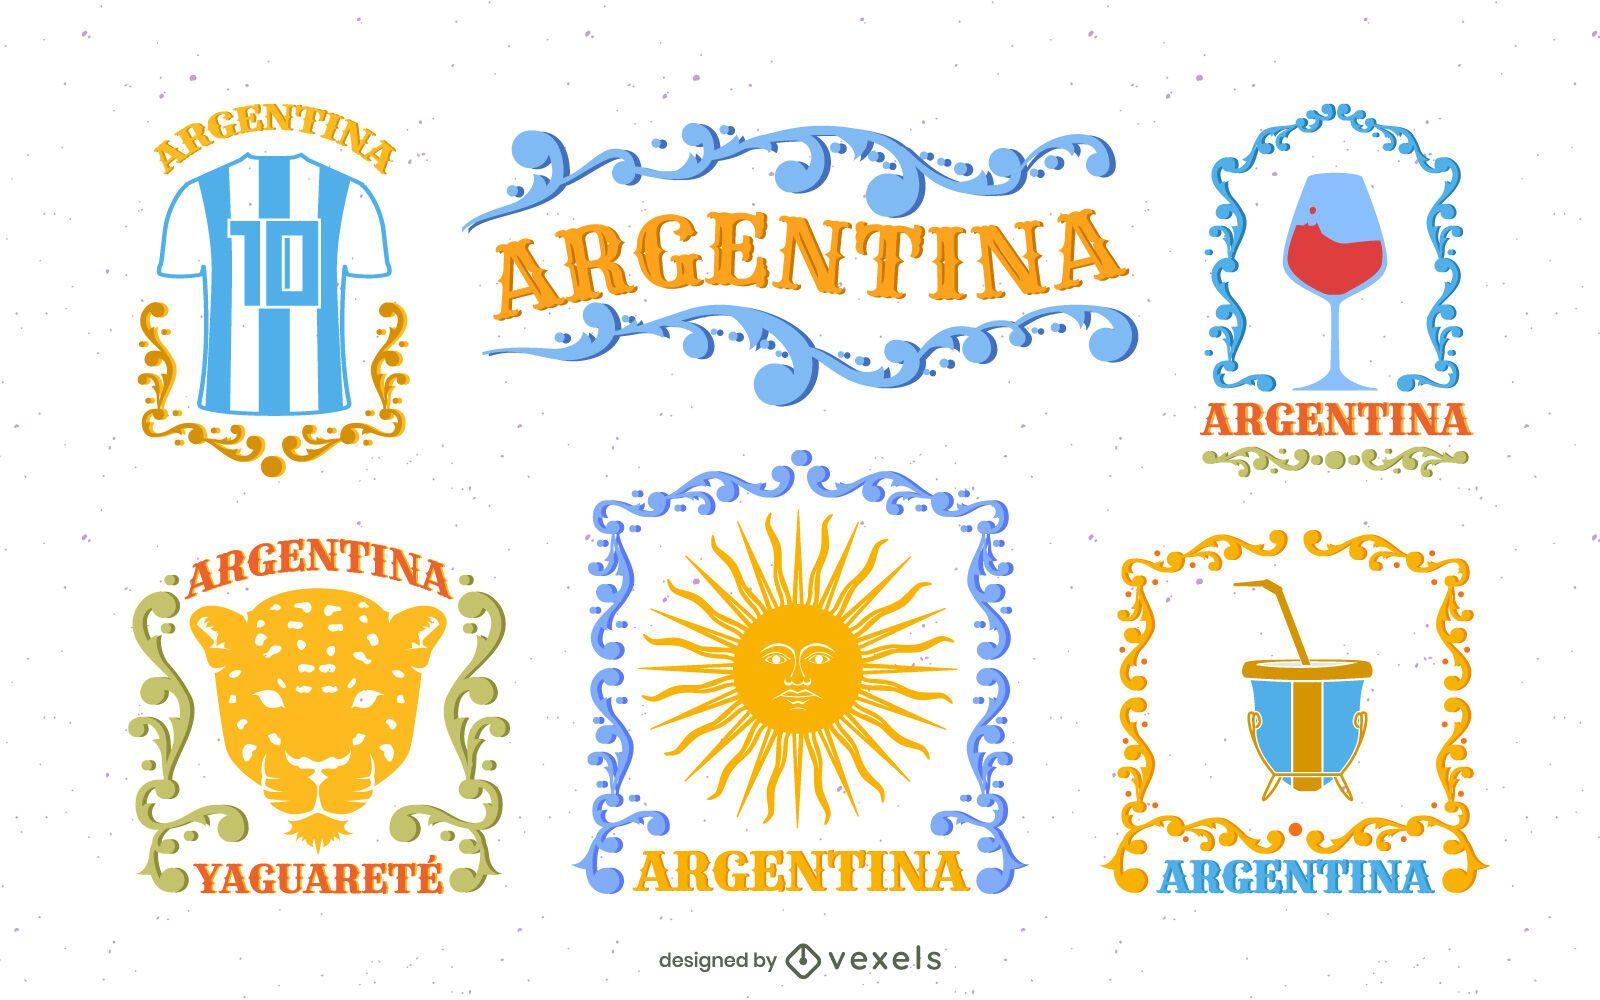 Fileteado Style Argentina Elements Pack